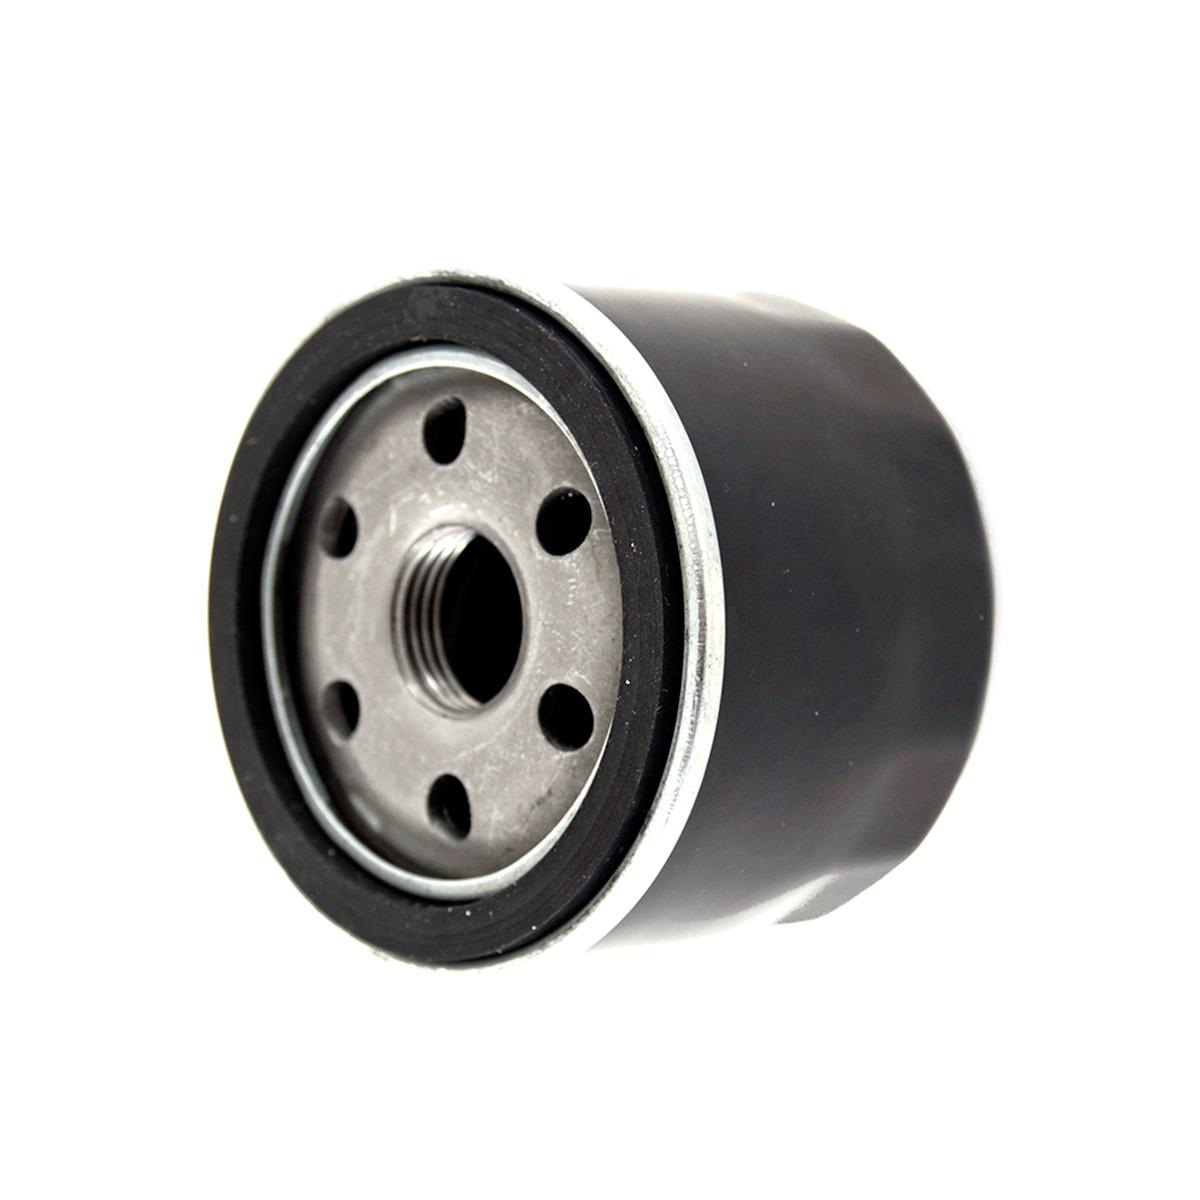 Cub Cadet Engine Oil Filter 951-12690 | Power Mower Sales